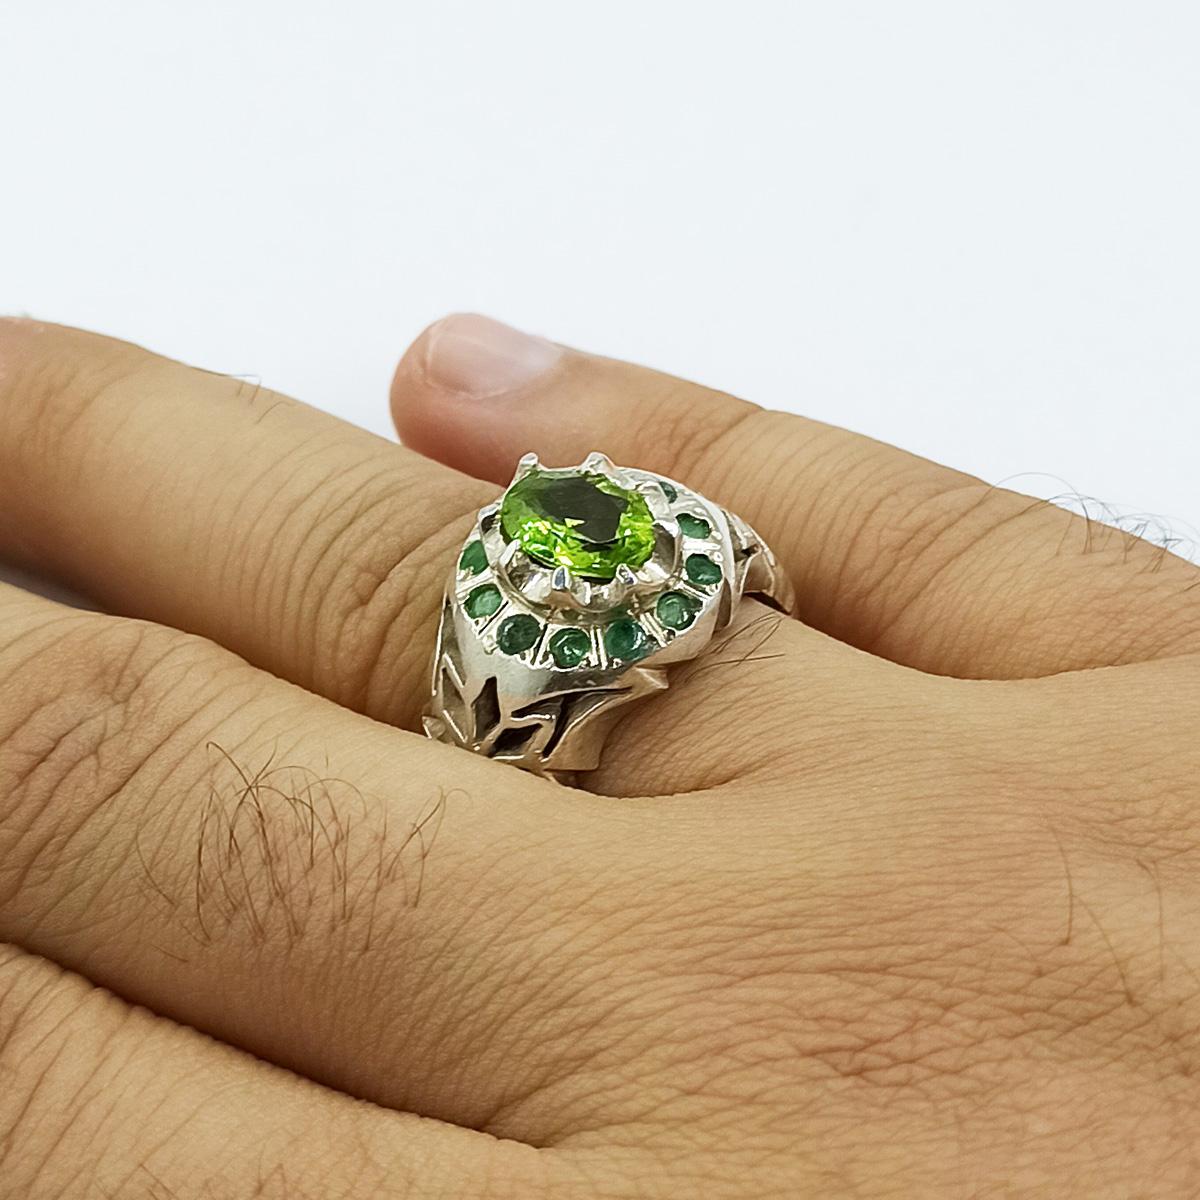 انگشتر نقره مردانه سلین کالا مدل زبرجد ce-As170